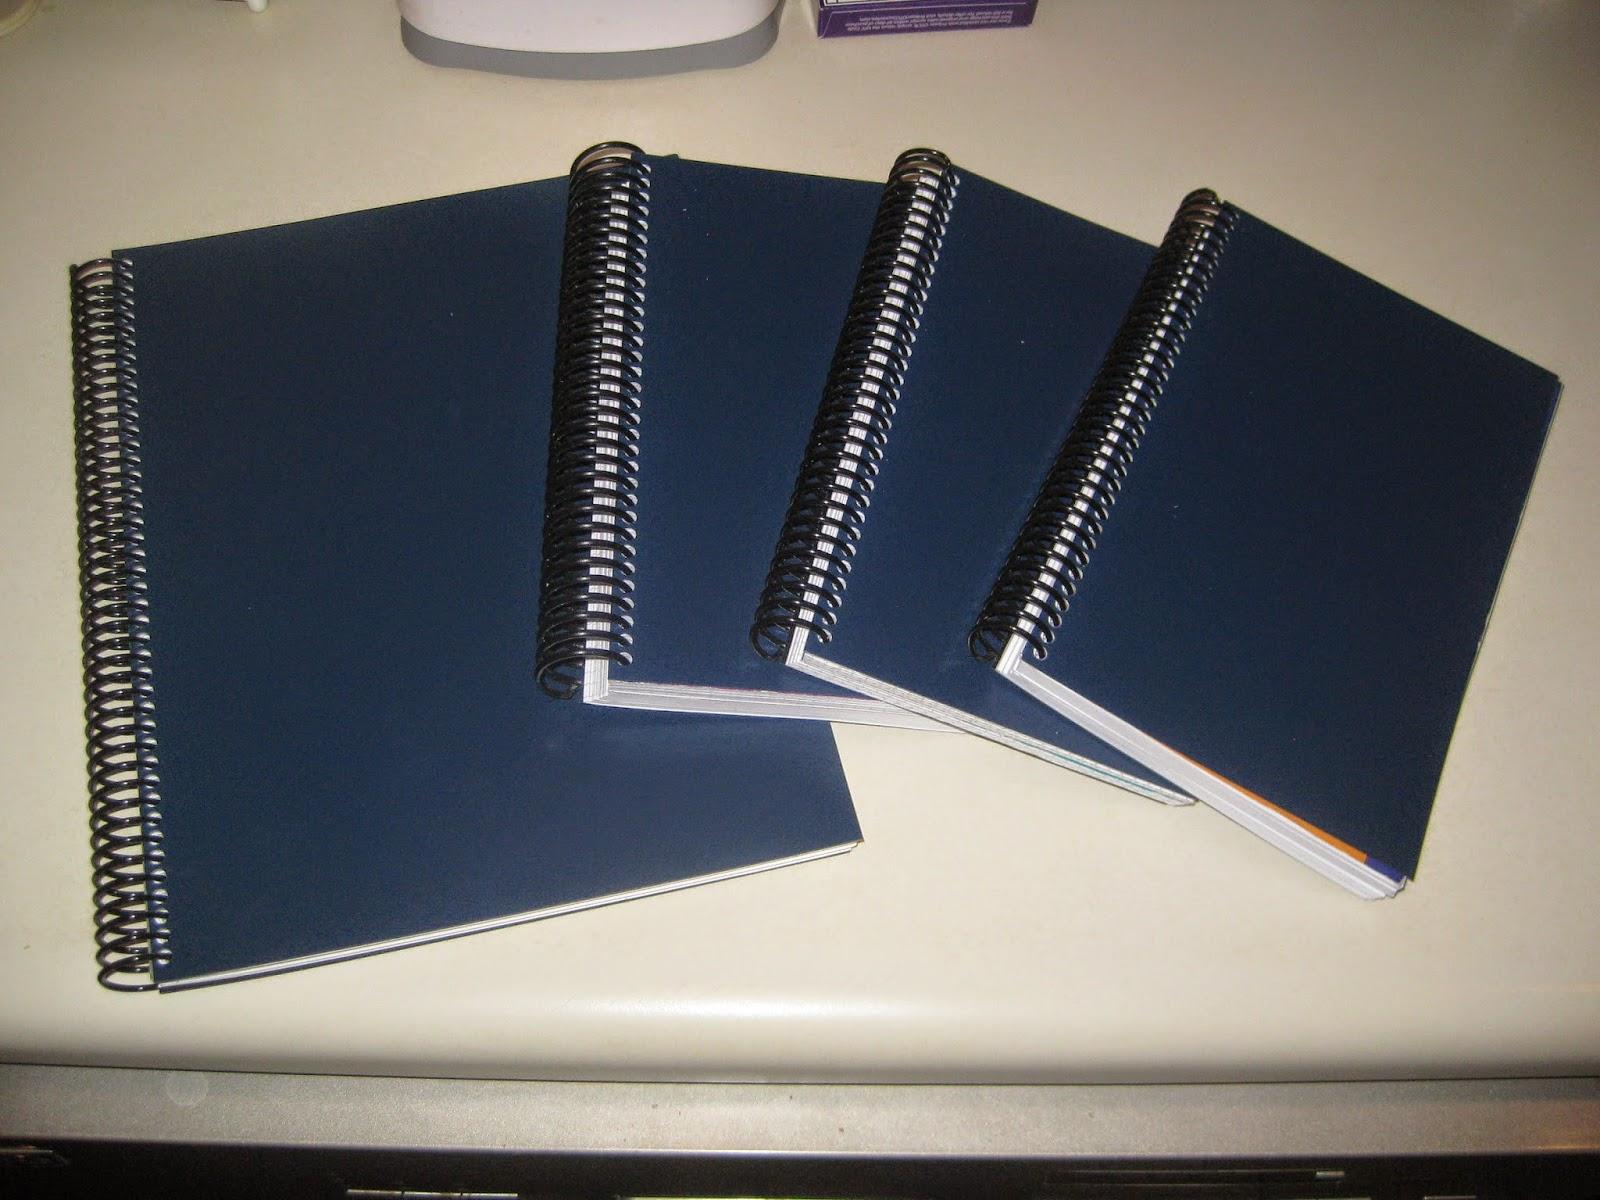 http://shortcircuitprojects.blogspot.com/2015/01/spiral-bound-forrest-mims-books.html